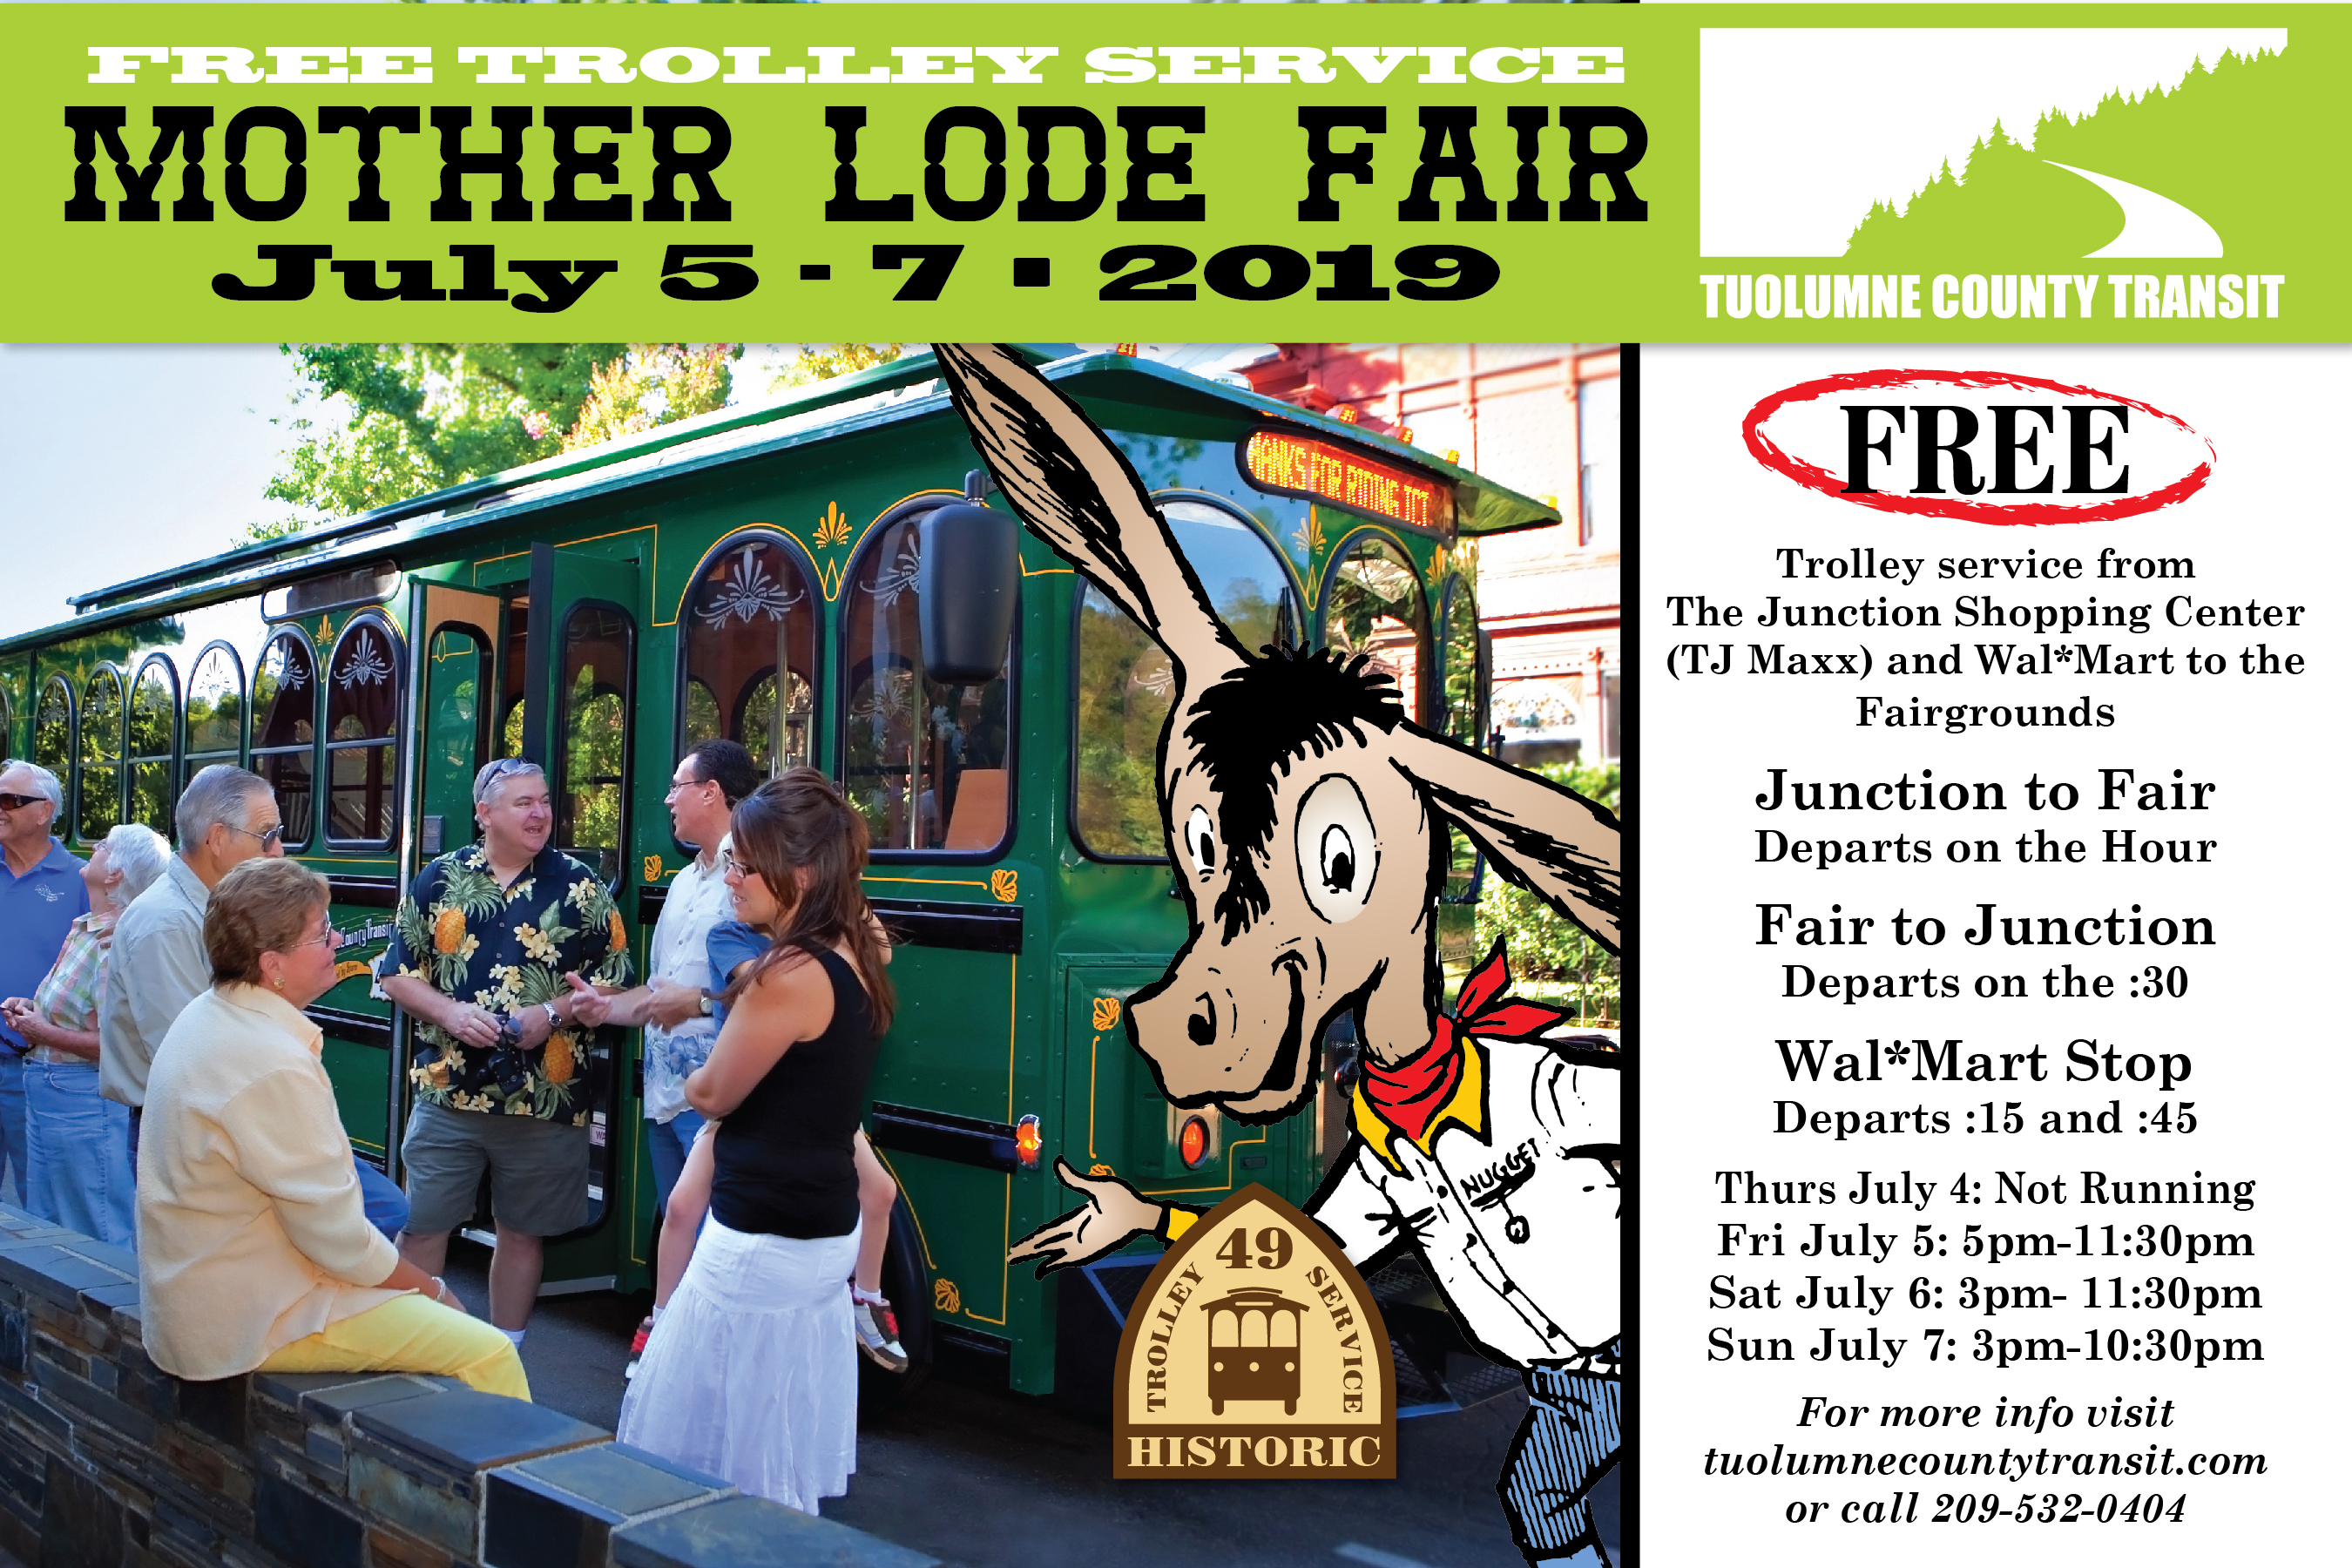 Mother Lode Fair Service   Public Transportation   United